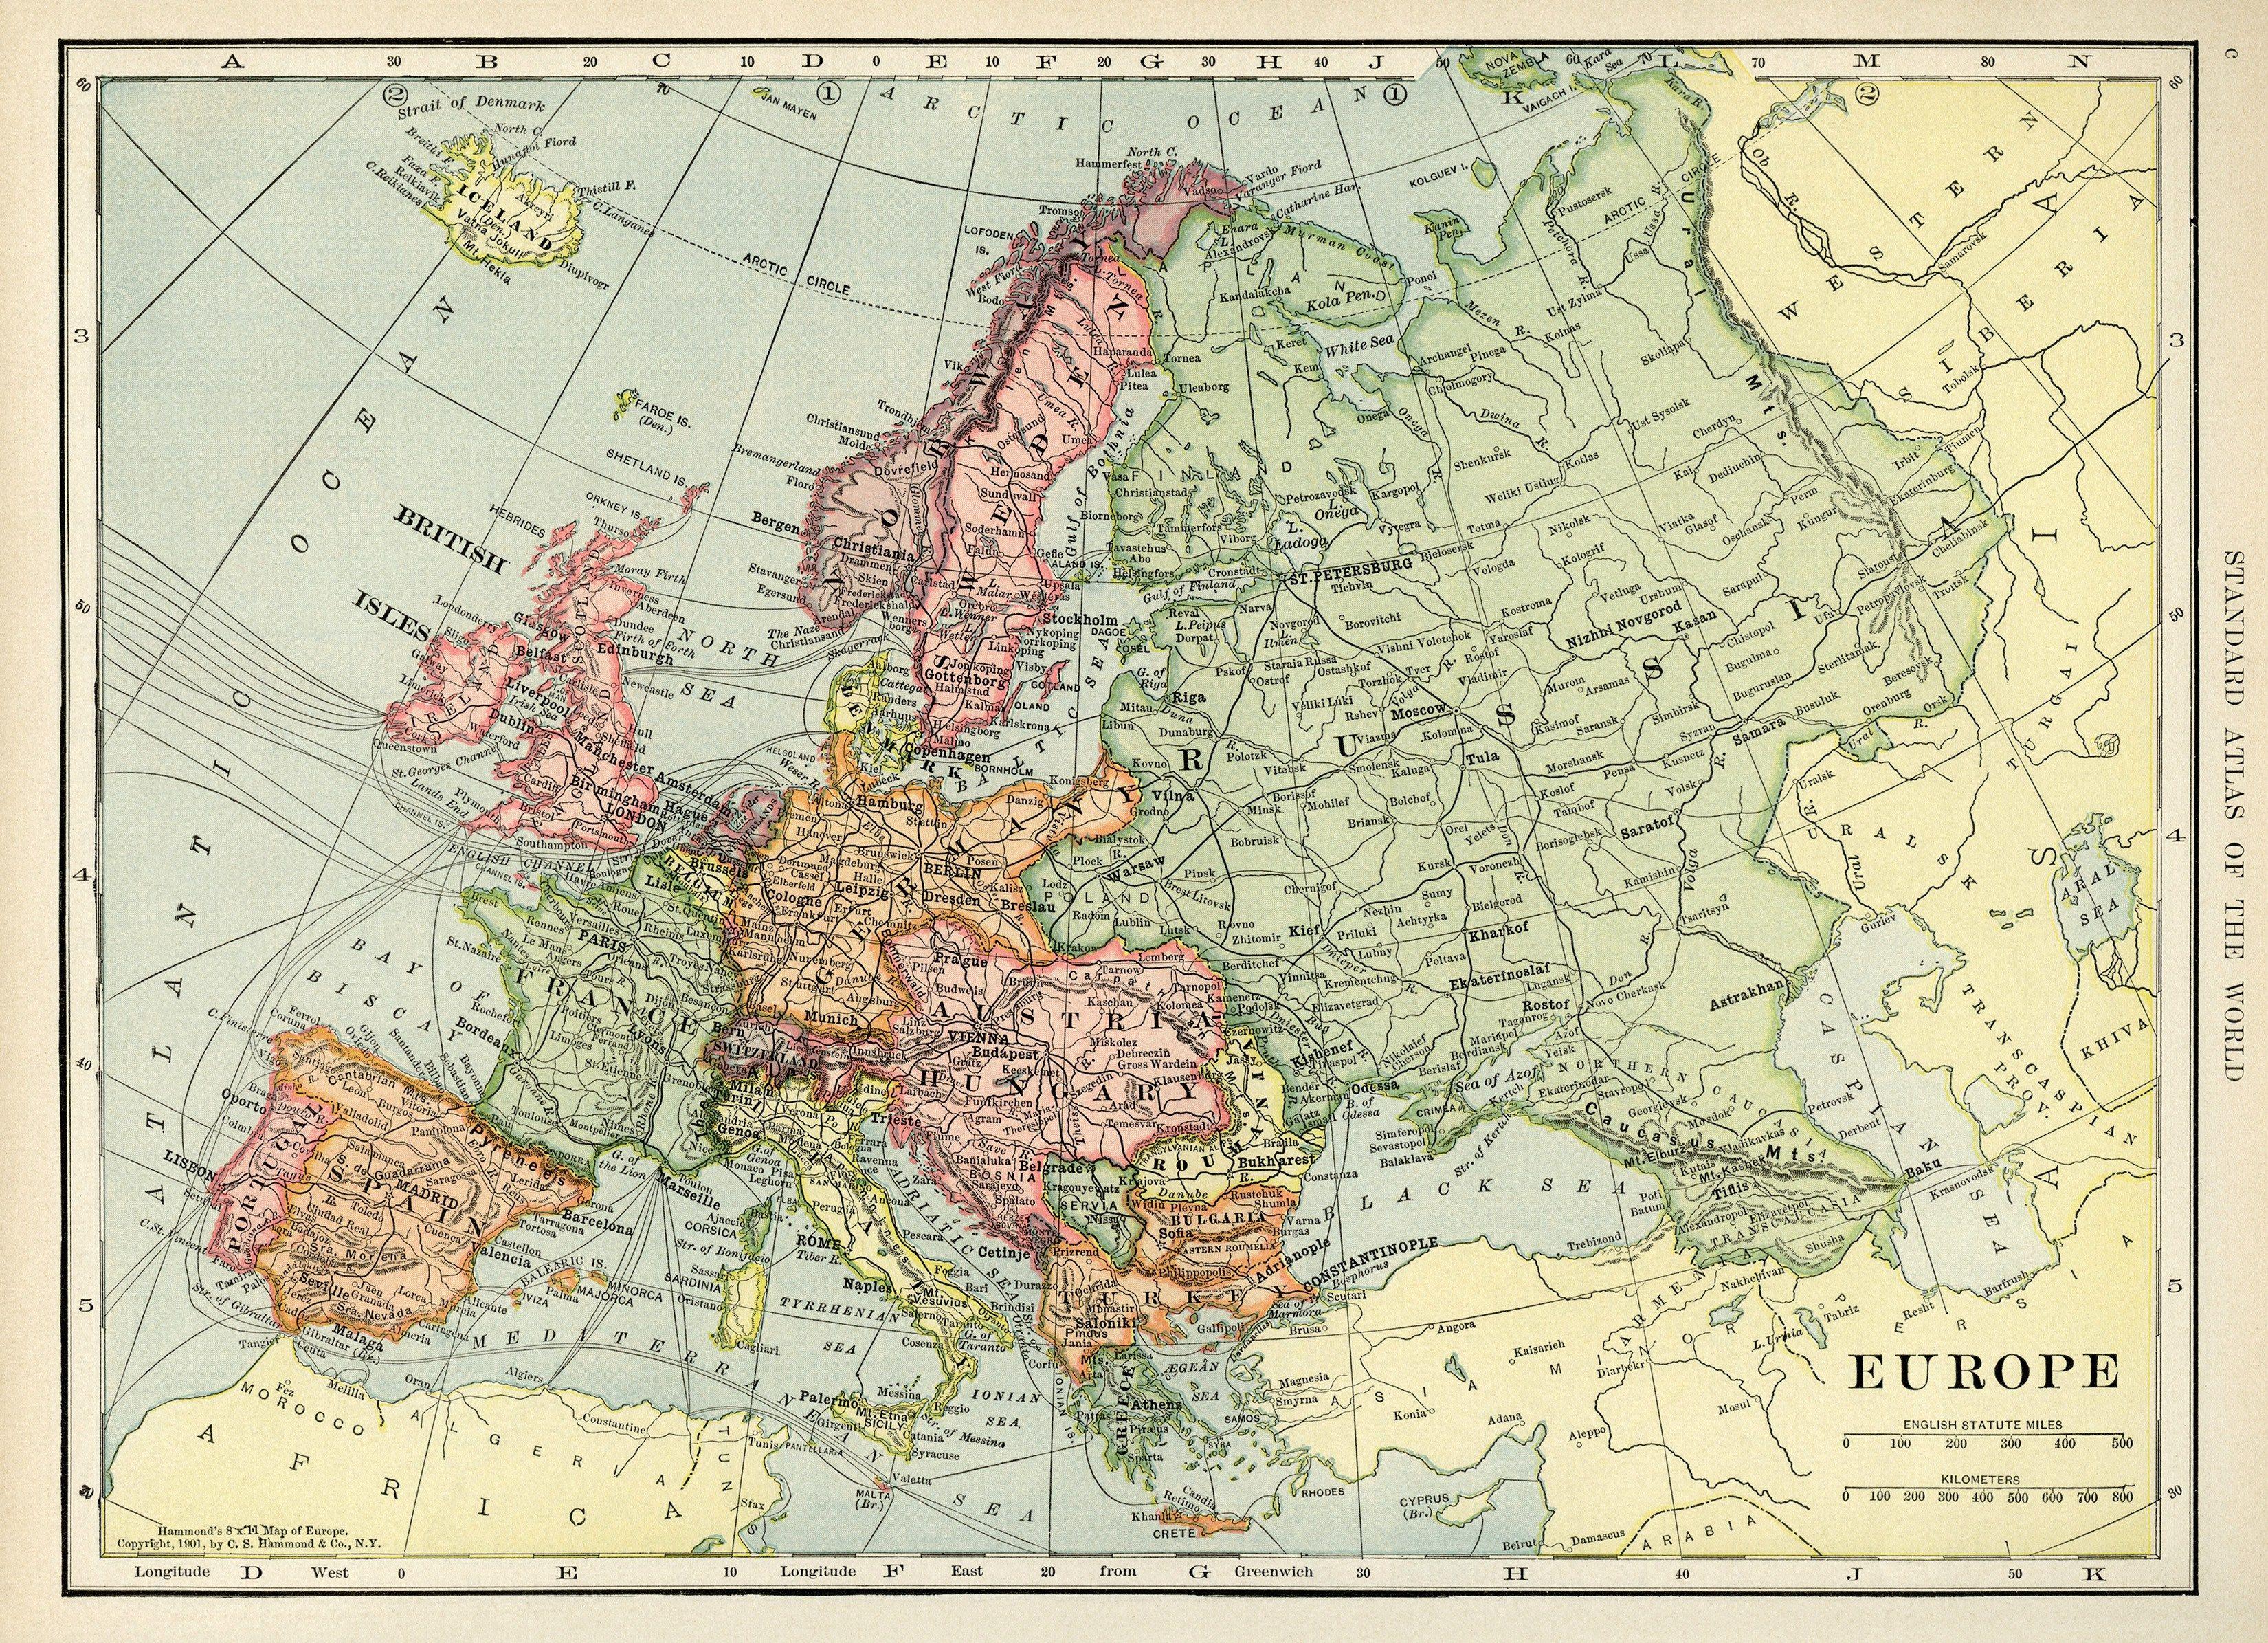 Europe map vintage map download antique map c s hammond europe map vintage map download antique map c s hammond history geography europe gumiabroncs Images